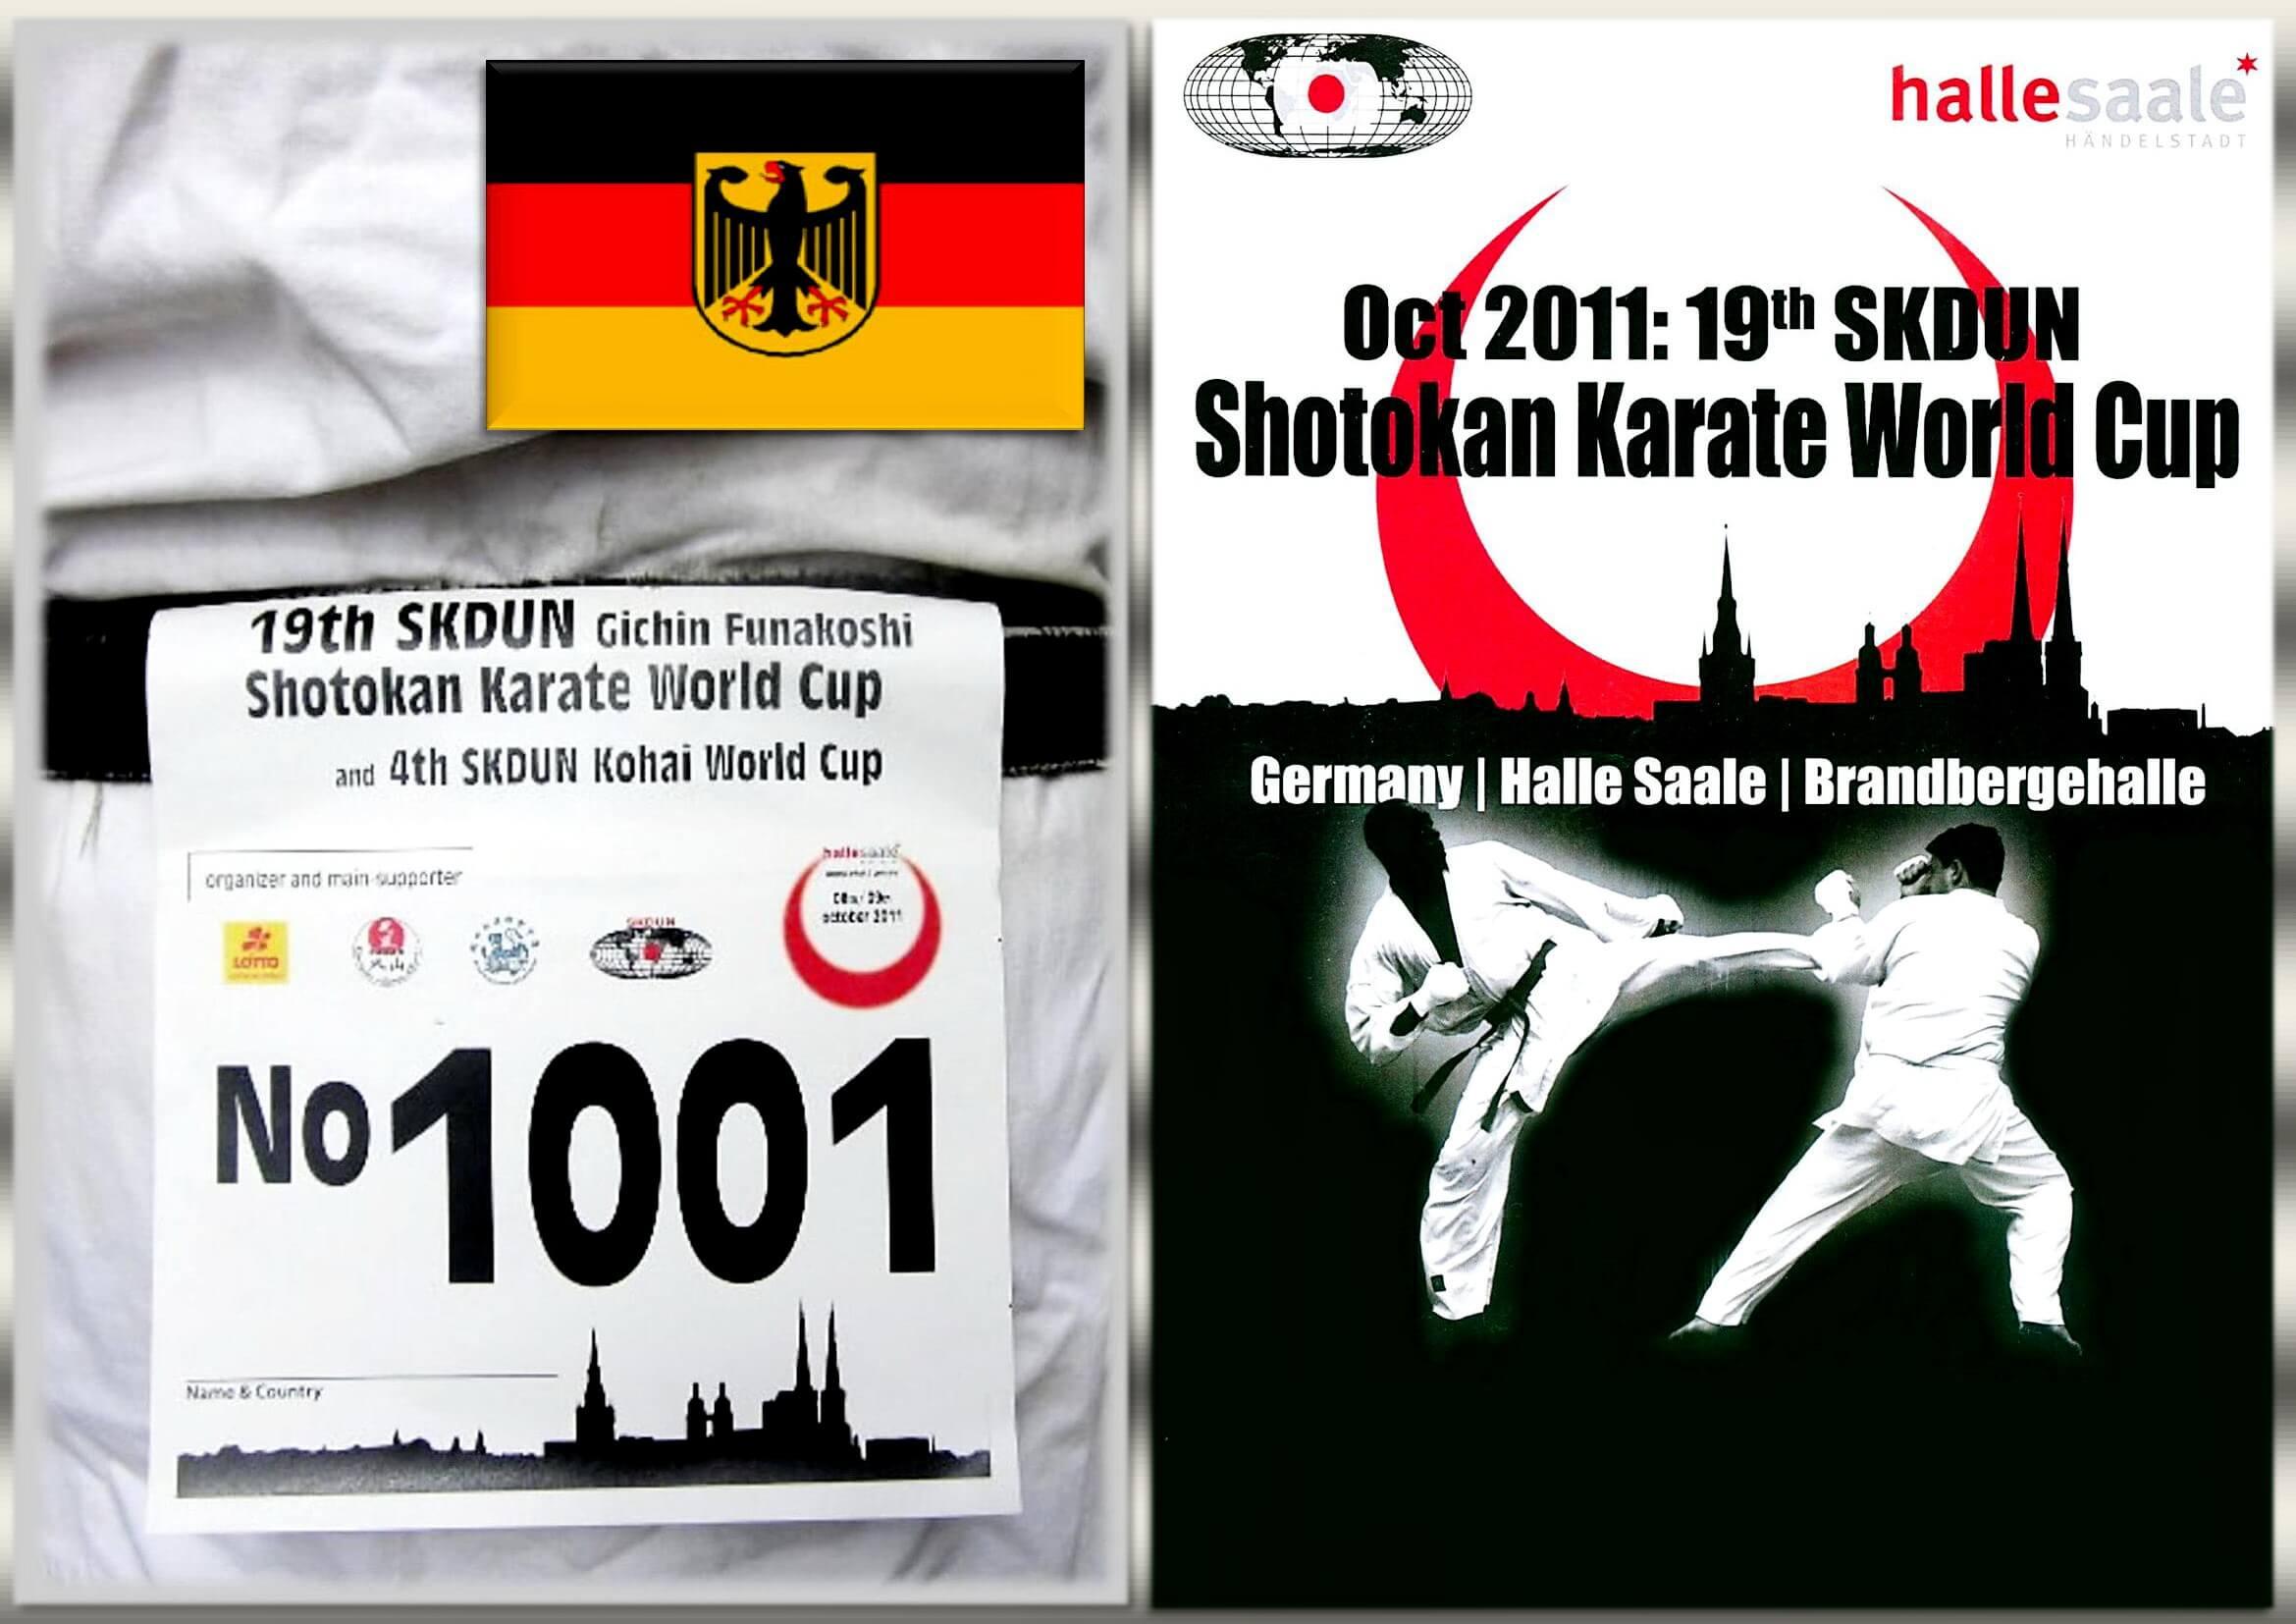 SKDUN-2011 Галле-2011 Постер